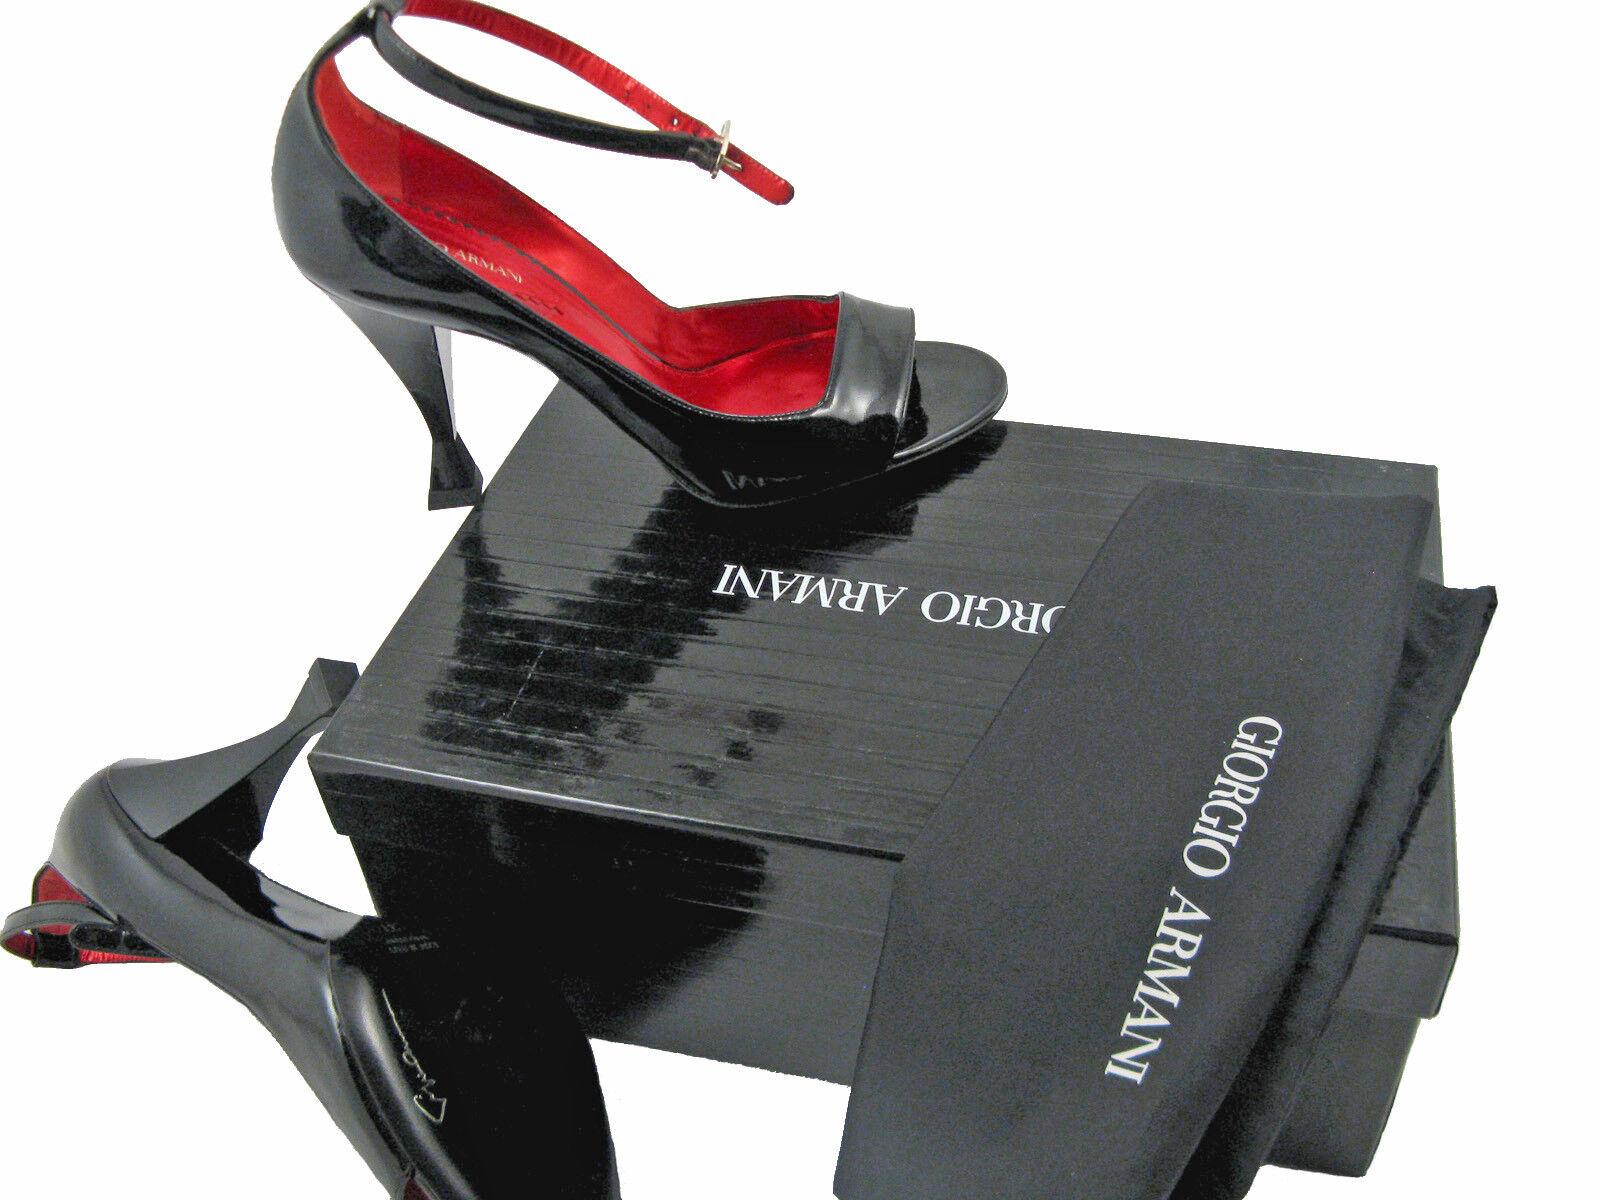 NEW  795 Giorgio Armani shoes (Heels)   US 8.5 e 38.5   Black Patent Leather